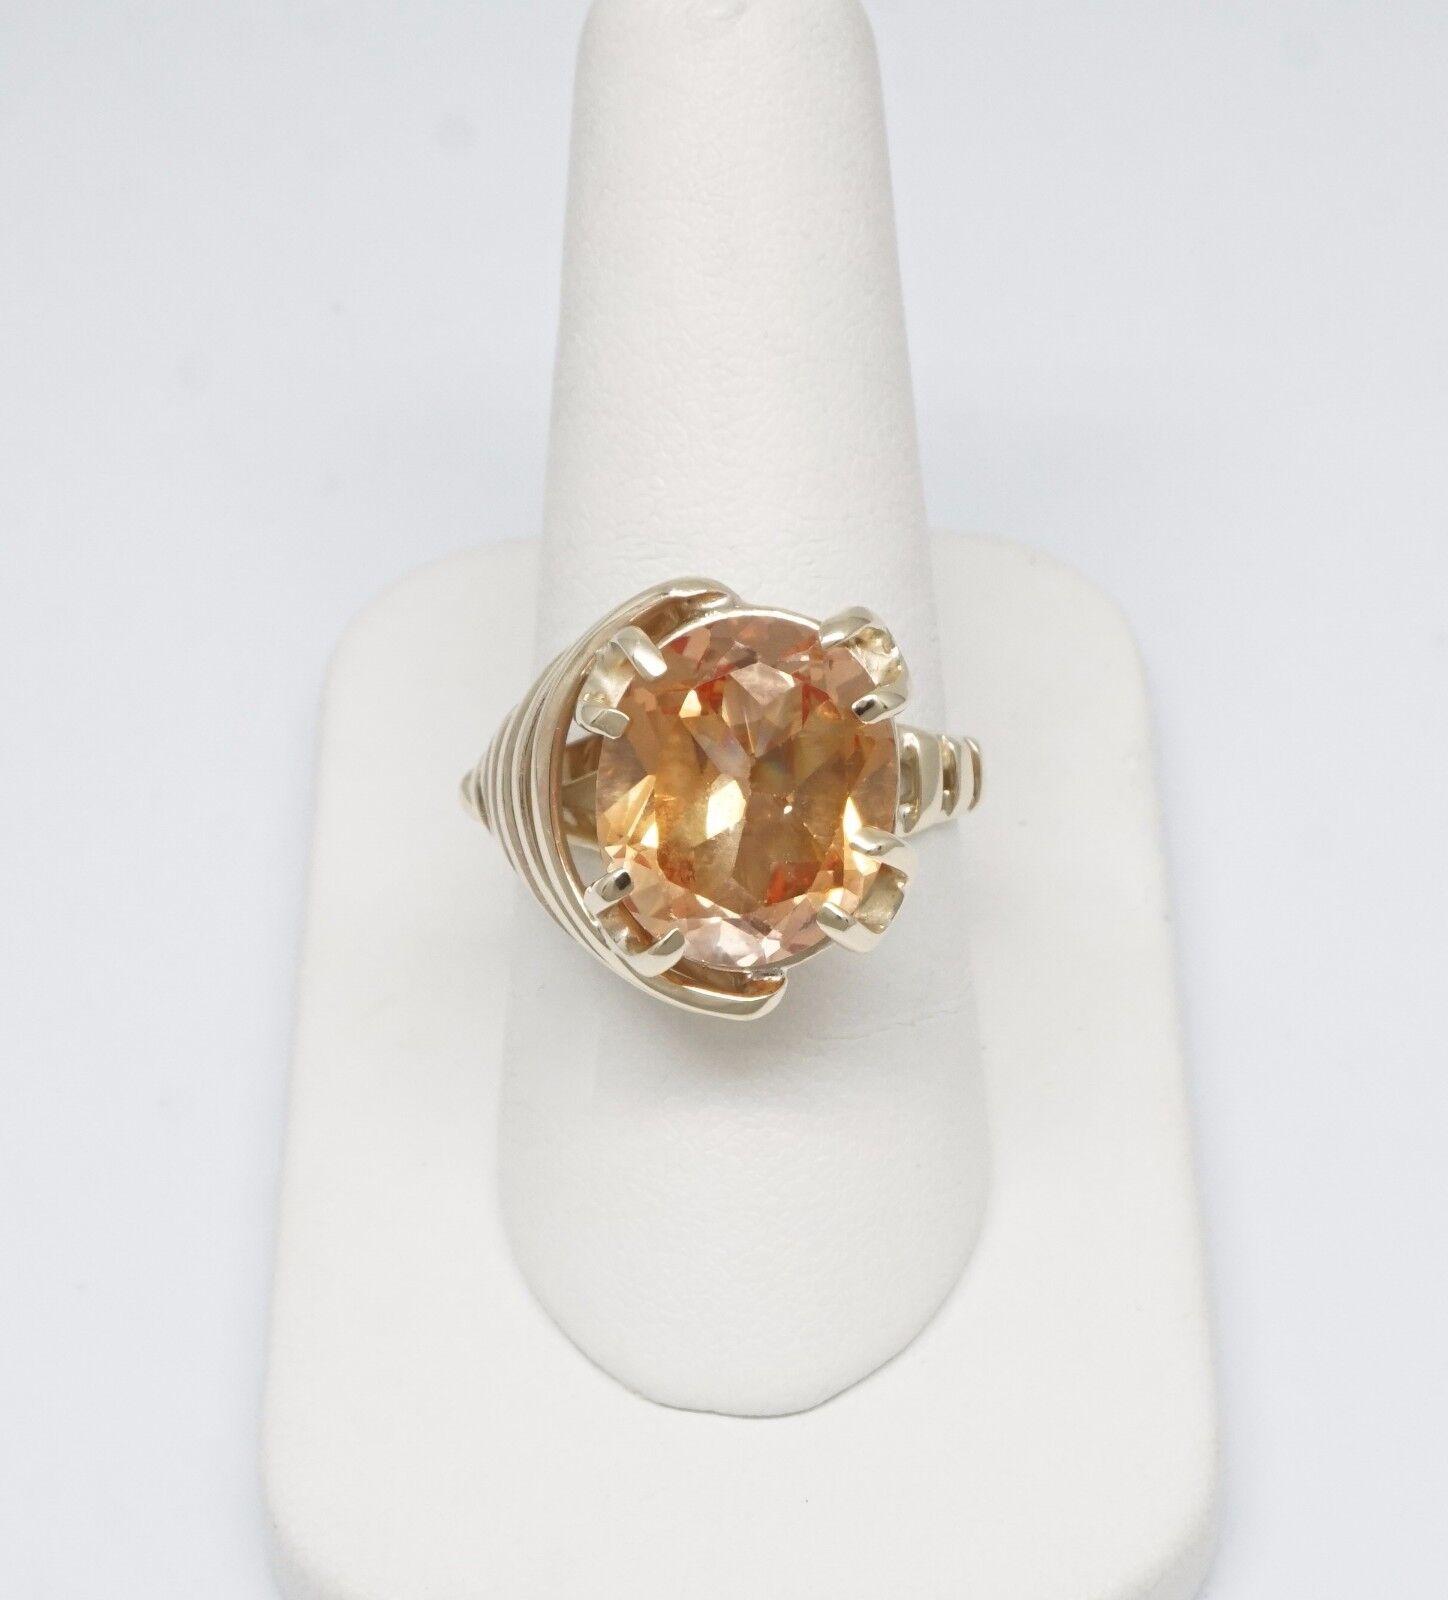 10K Yellow gold + - 8 1 4 CT TW Synthetic golden Quartz Fancy Statement Ring